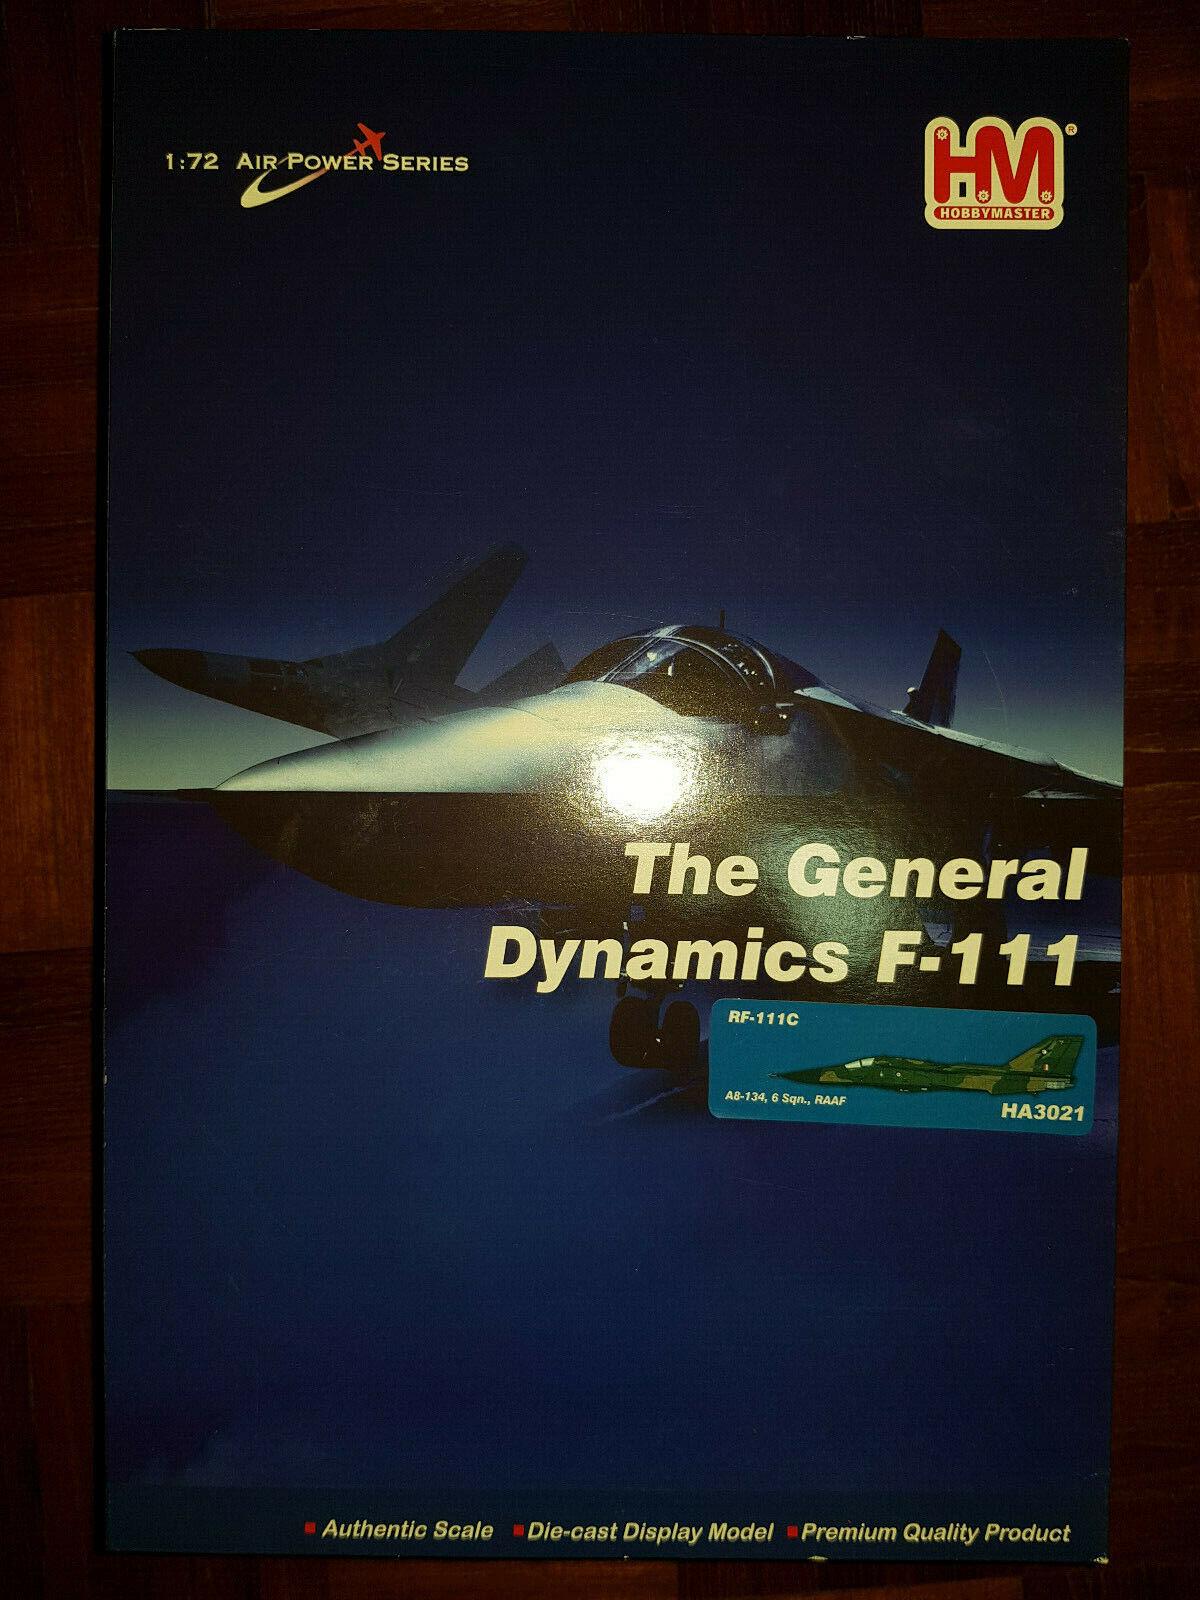 Modelo hobby master master master 1   72 RF - 111c 6th sqn raaf ha3021 130